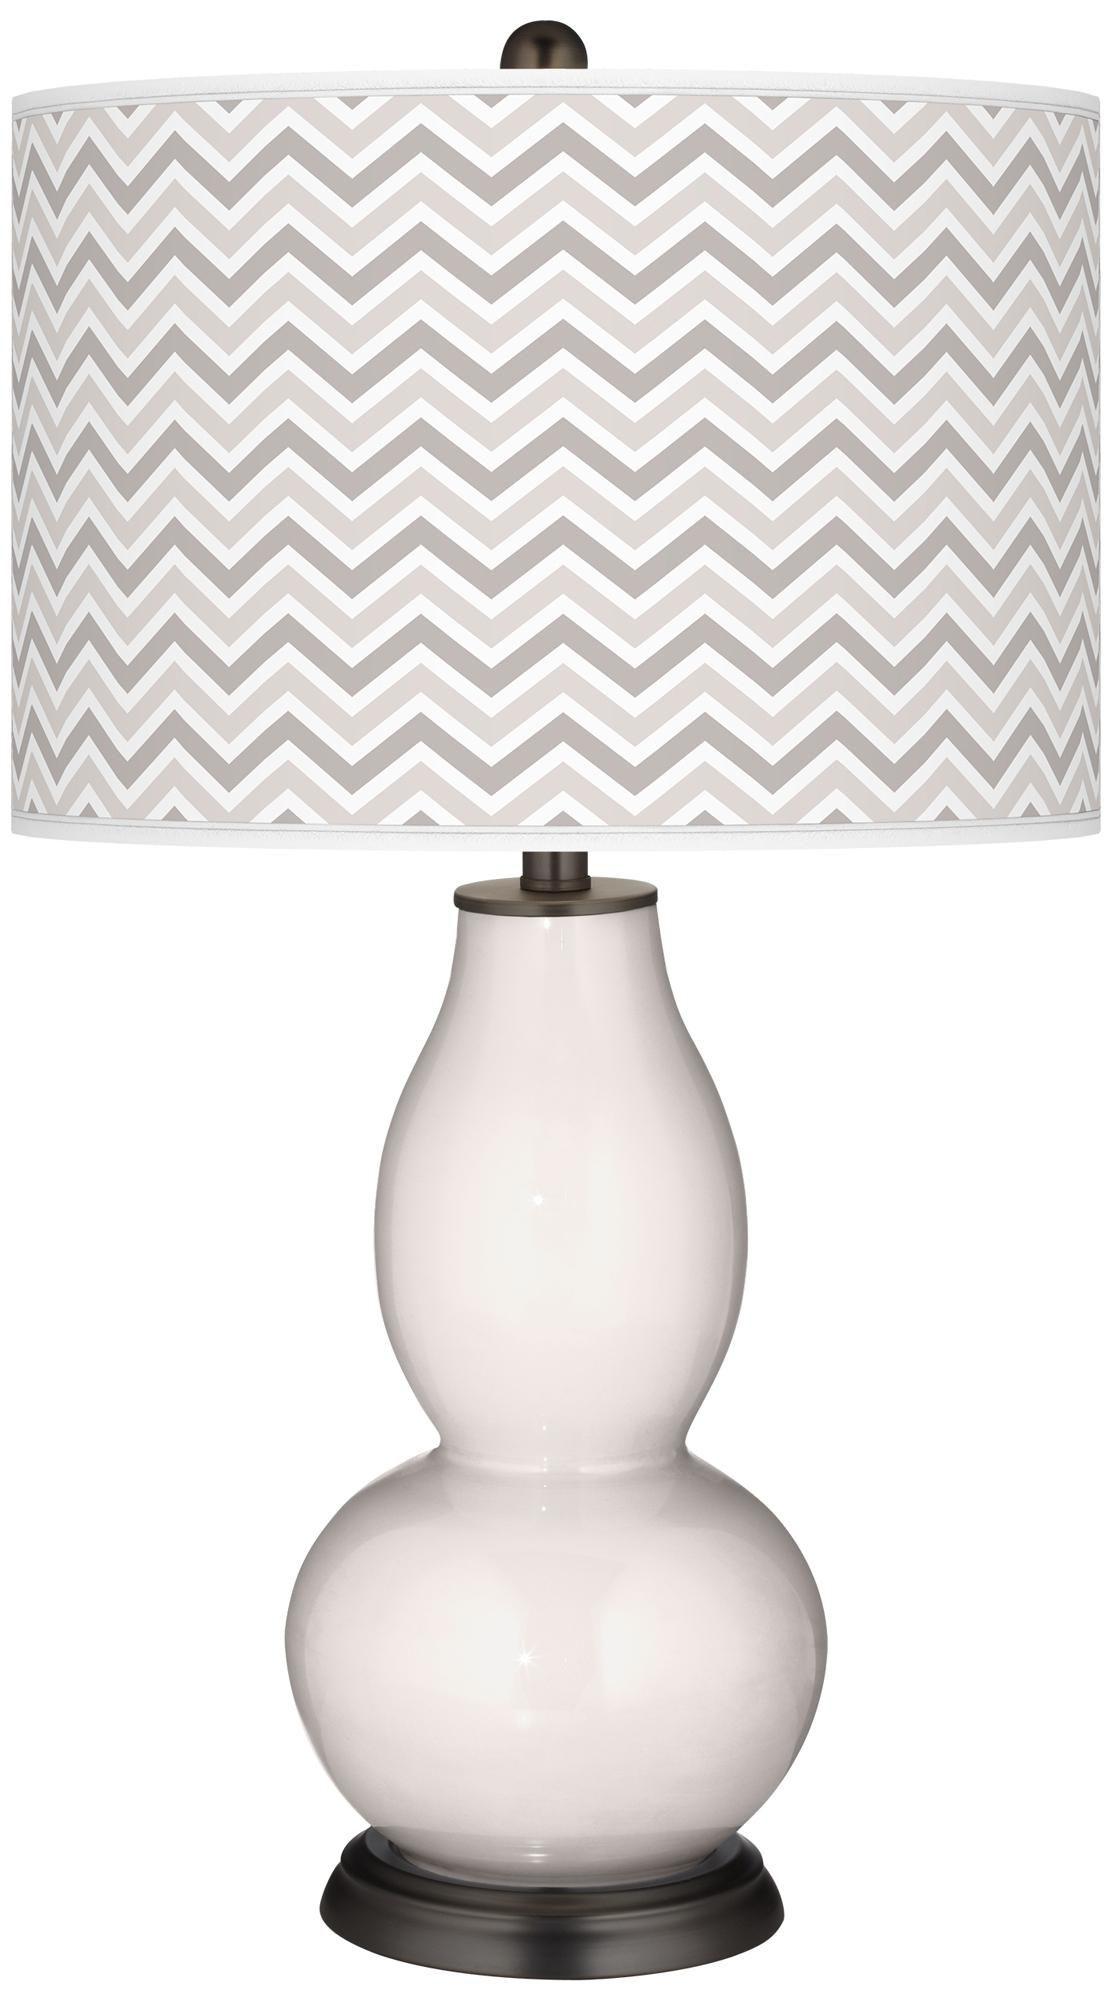 Smart White Narrow Zig Zag Double Gourd Table Lamp